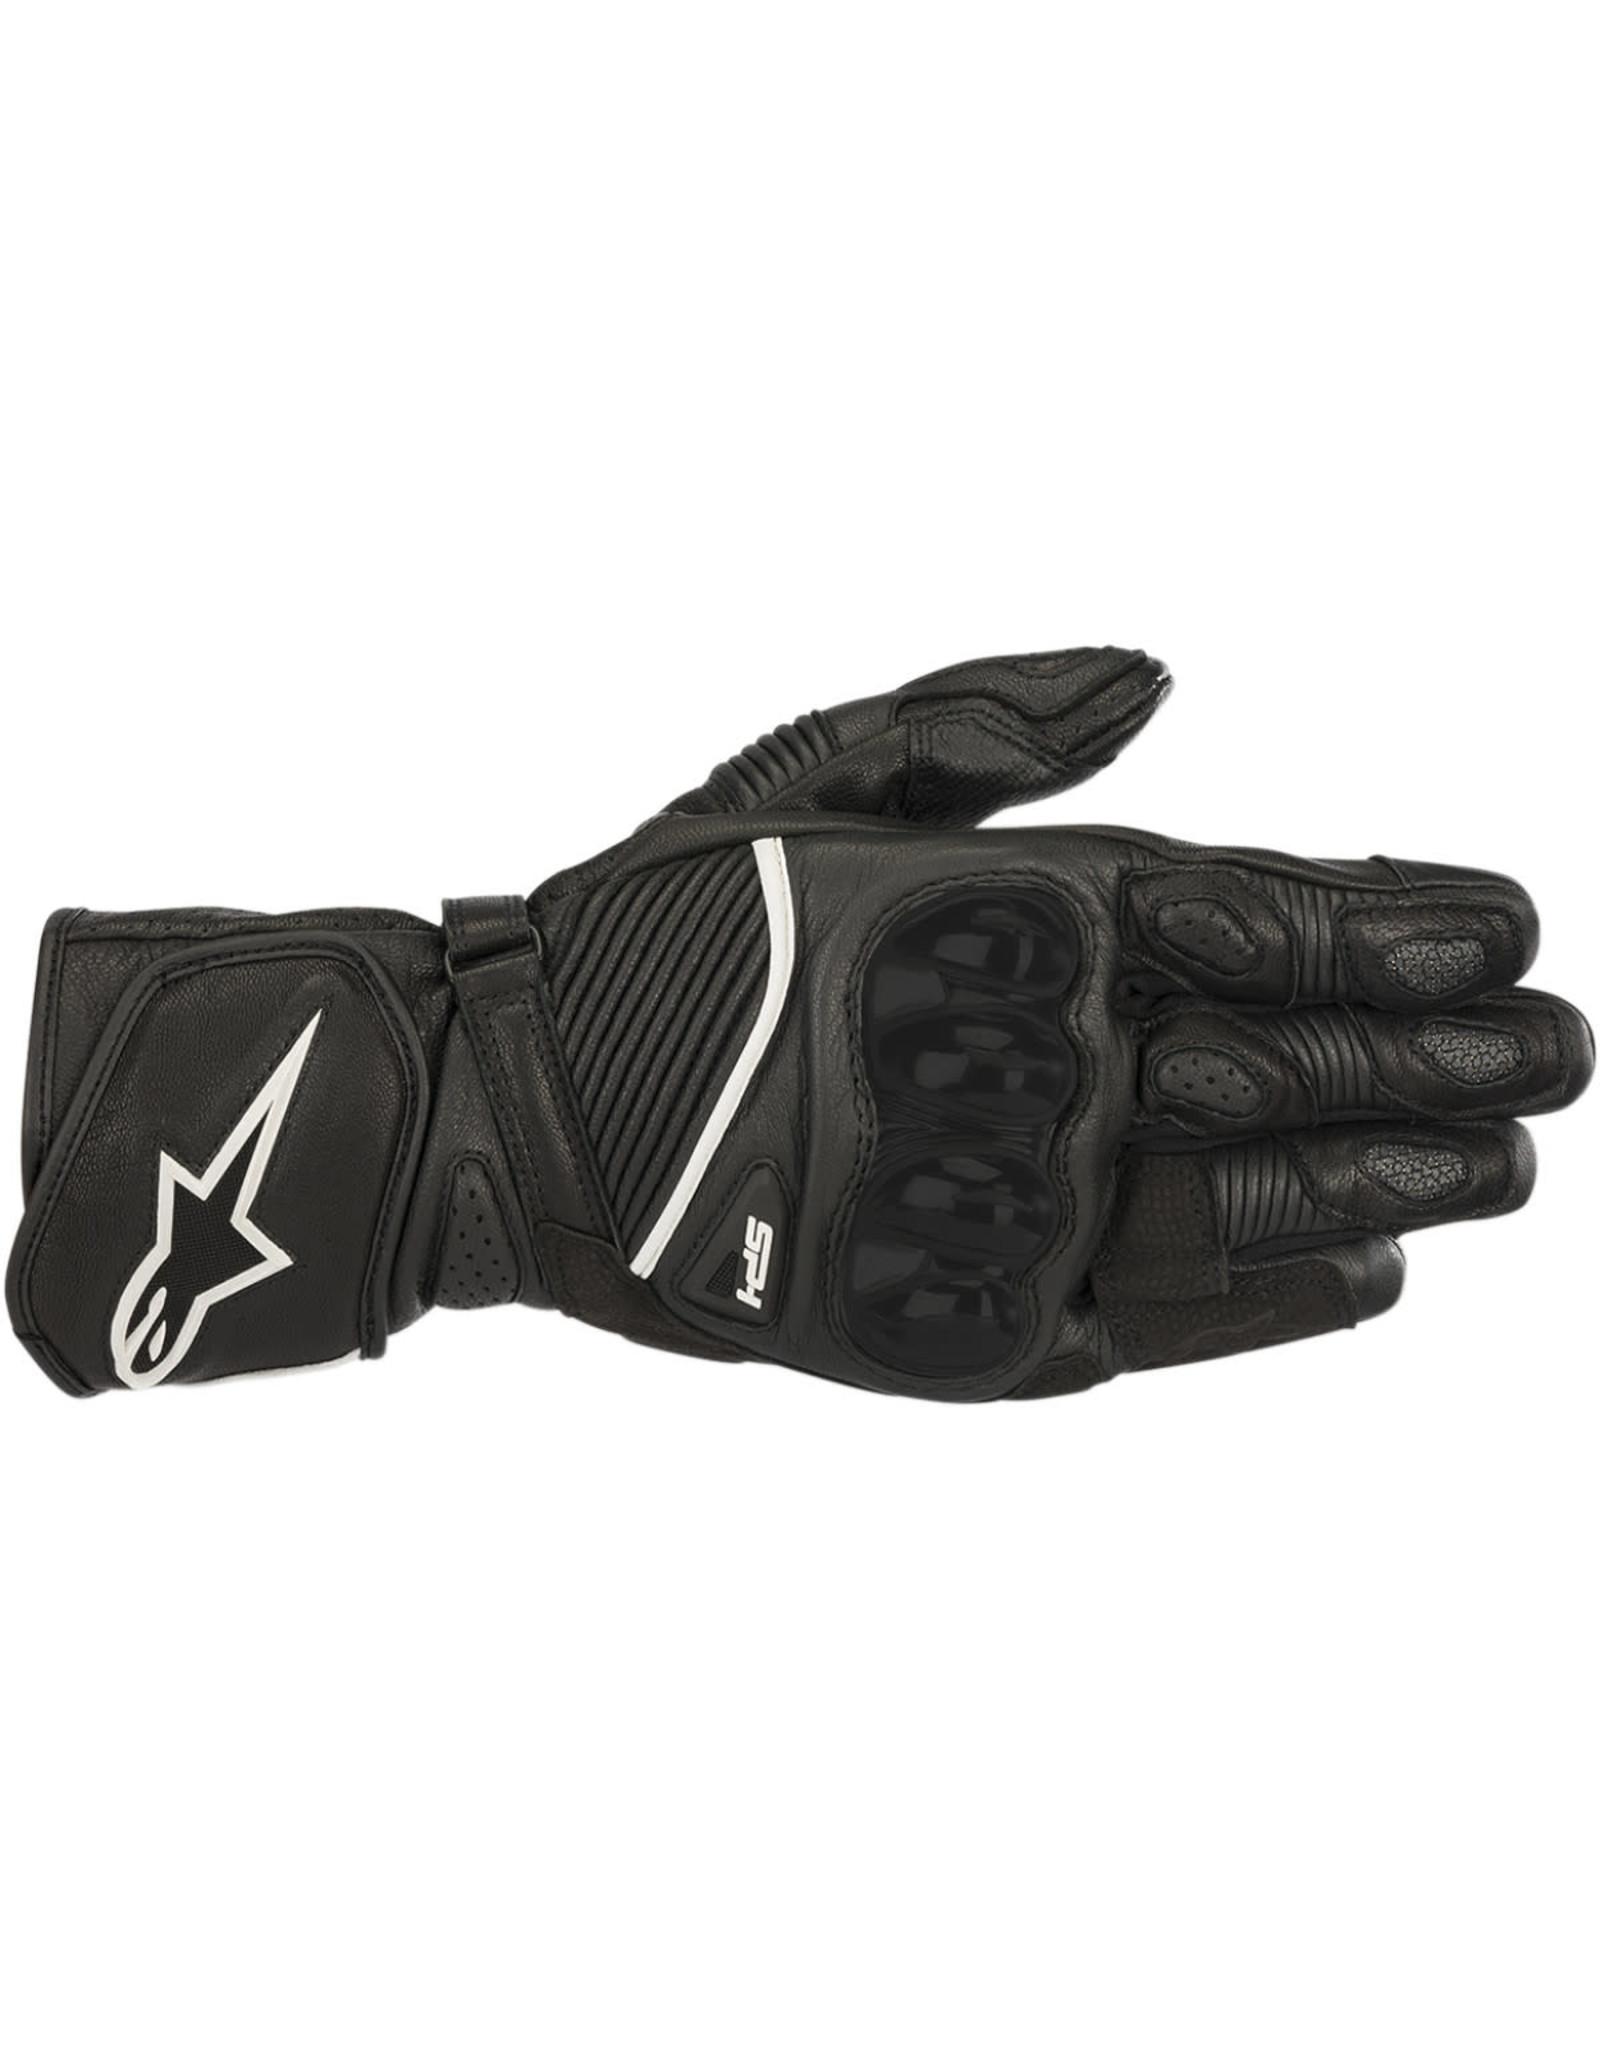 Alpinestars Alpinestars SP-1 Gloves